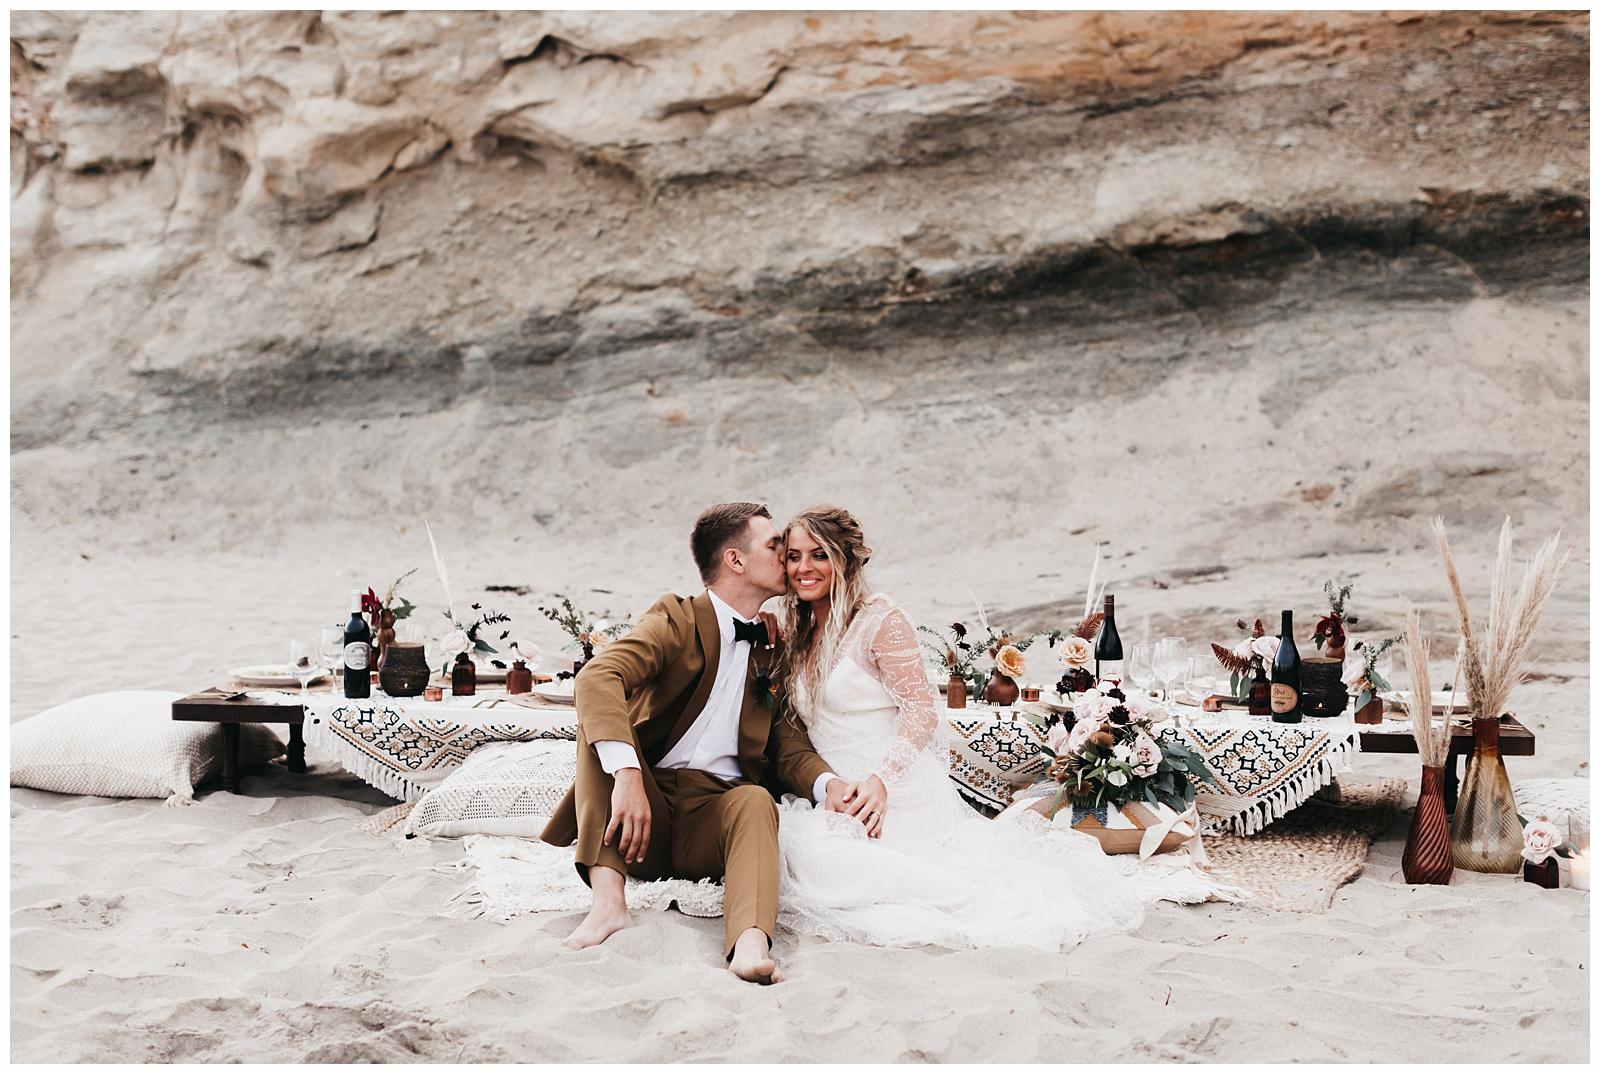 portland-wedding-photographer-pacific-city-elopement-photographer-anniezav_0056.jpg